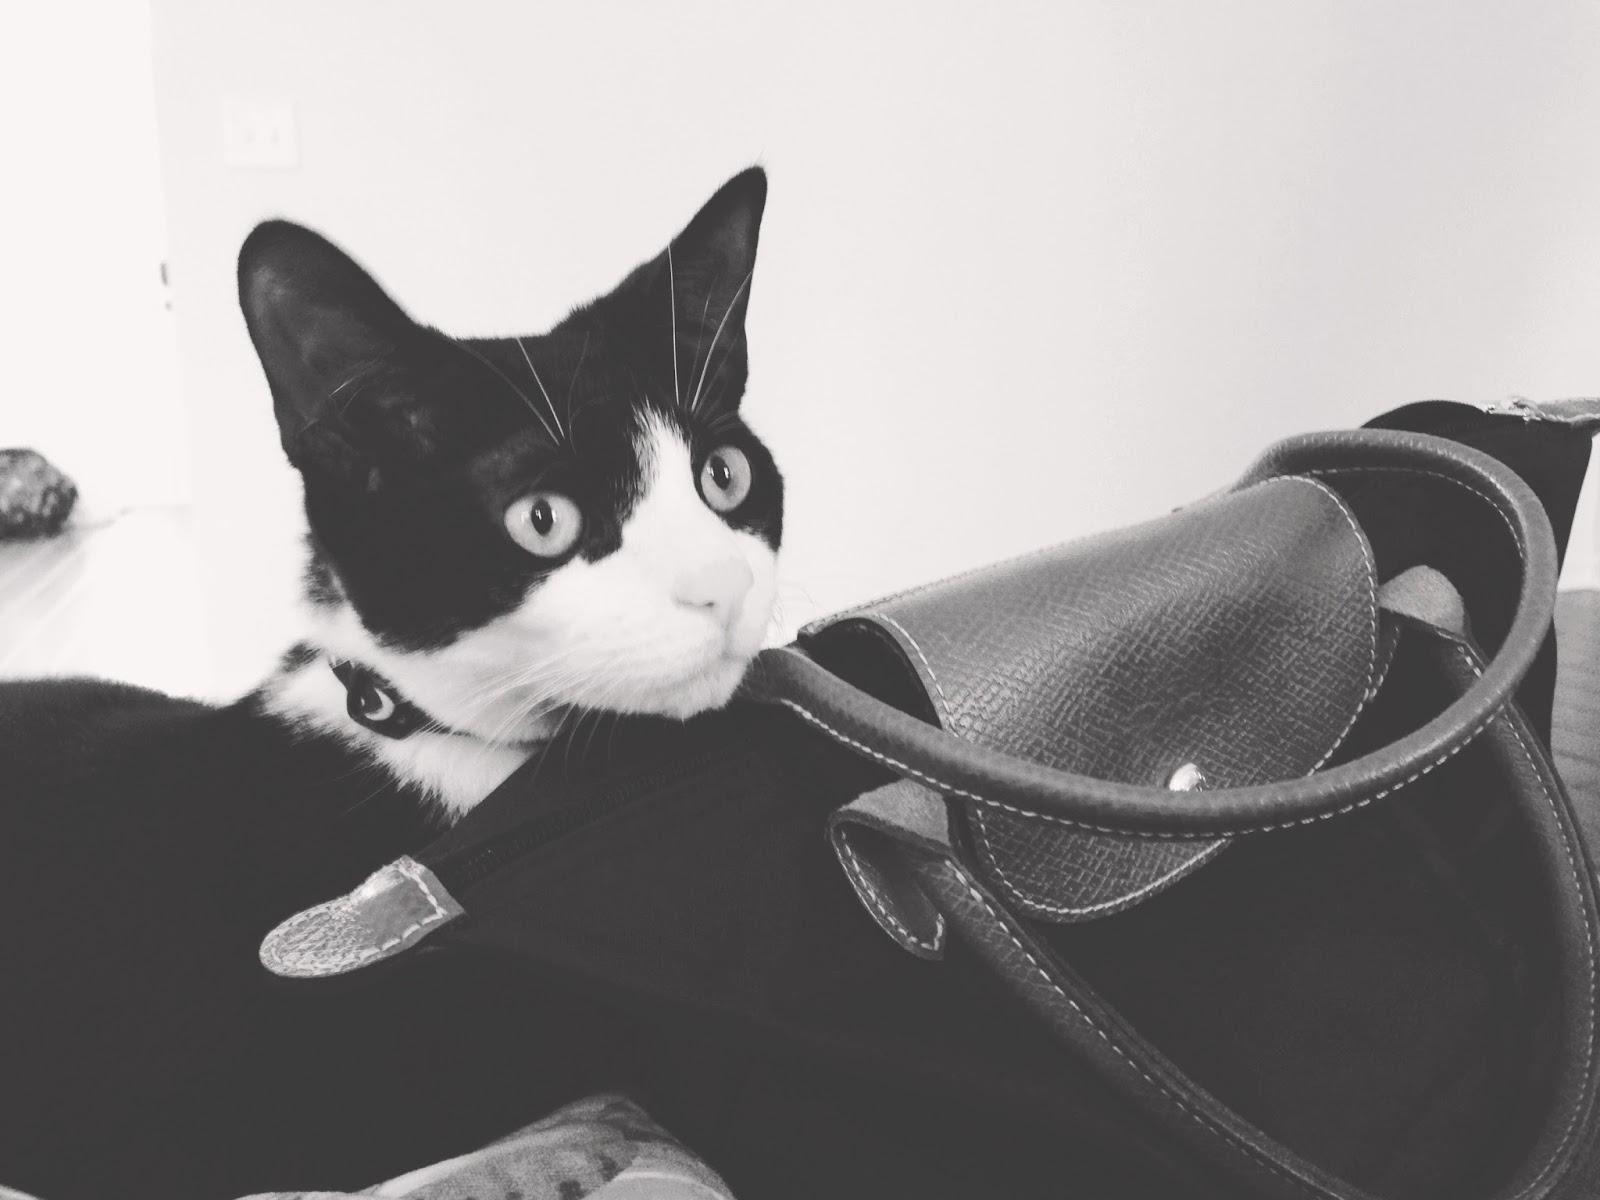 wedge (cat) posing by longchamp mini 'le pliage' handbag